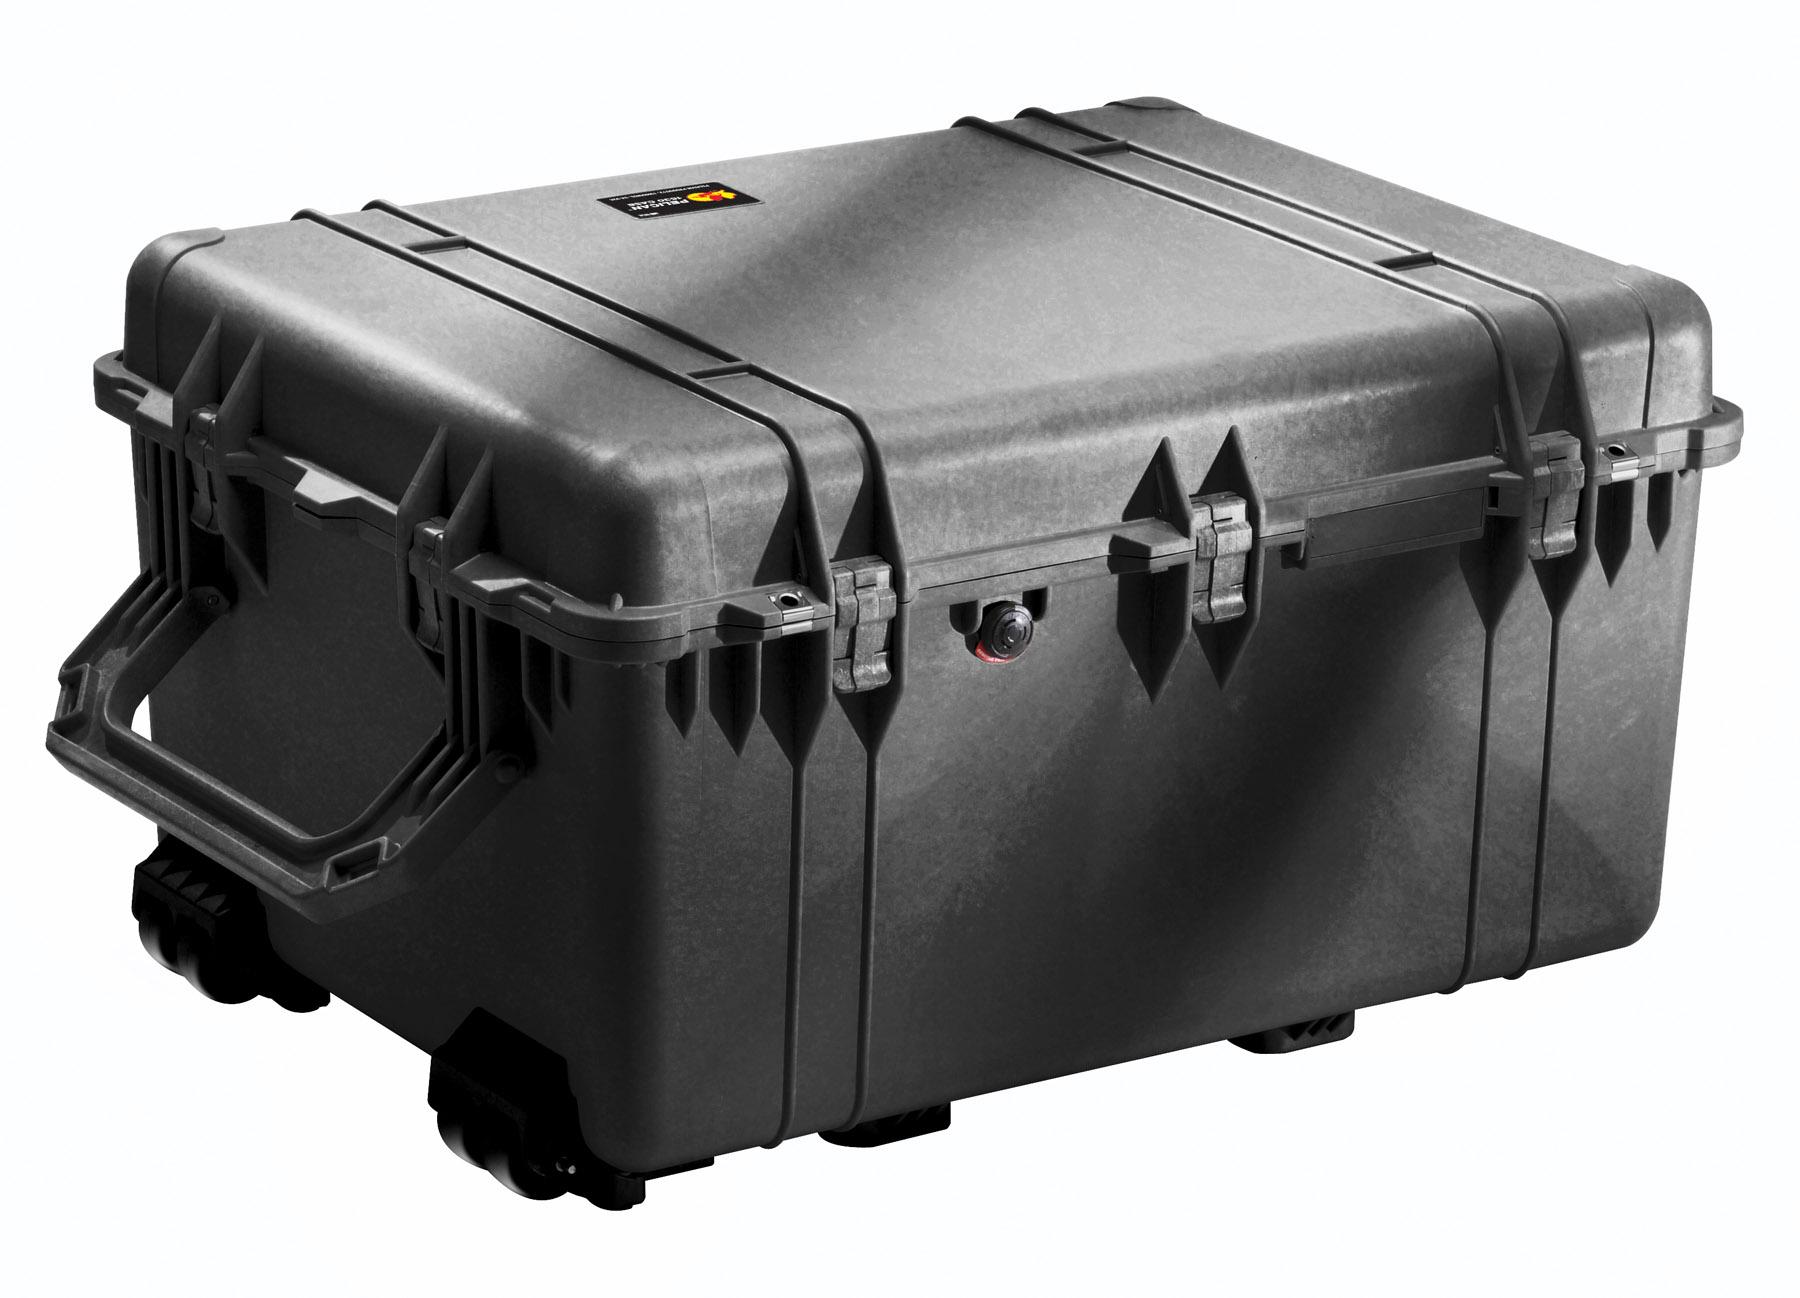 1630 - Pelican 1630 Large Pelican Hard Transport Case